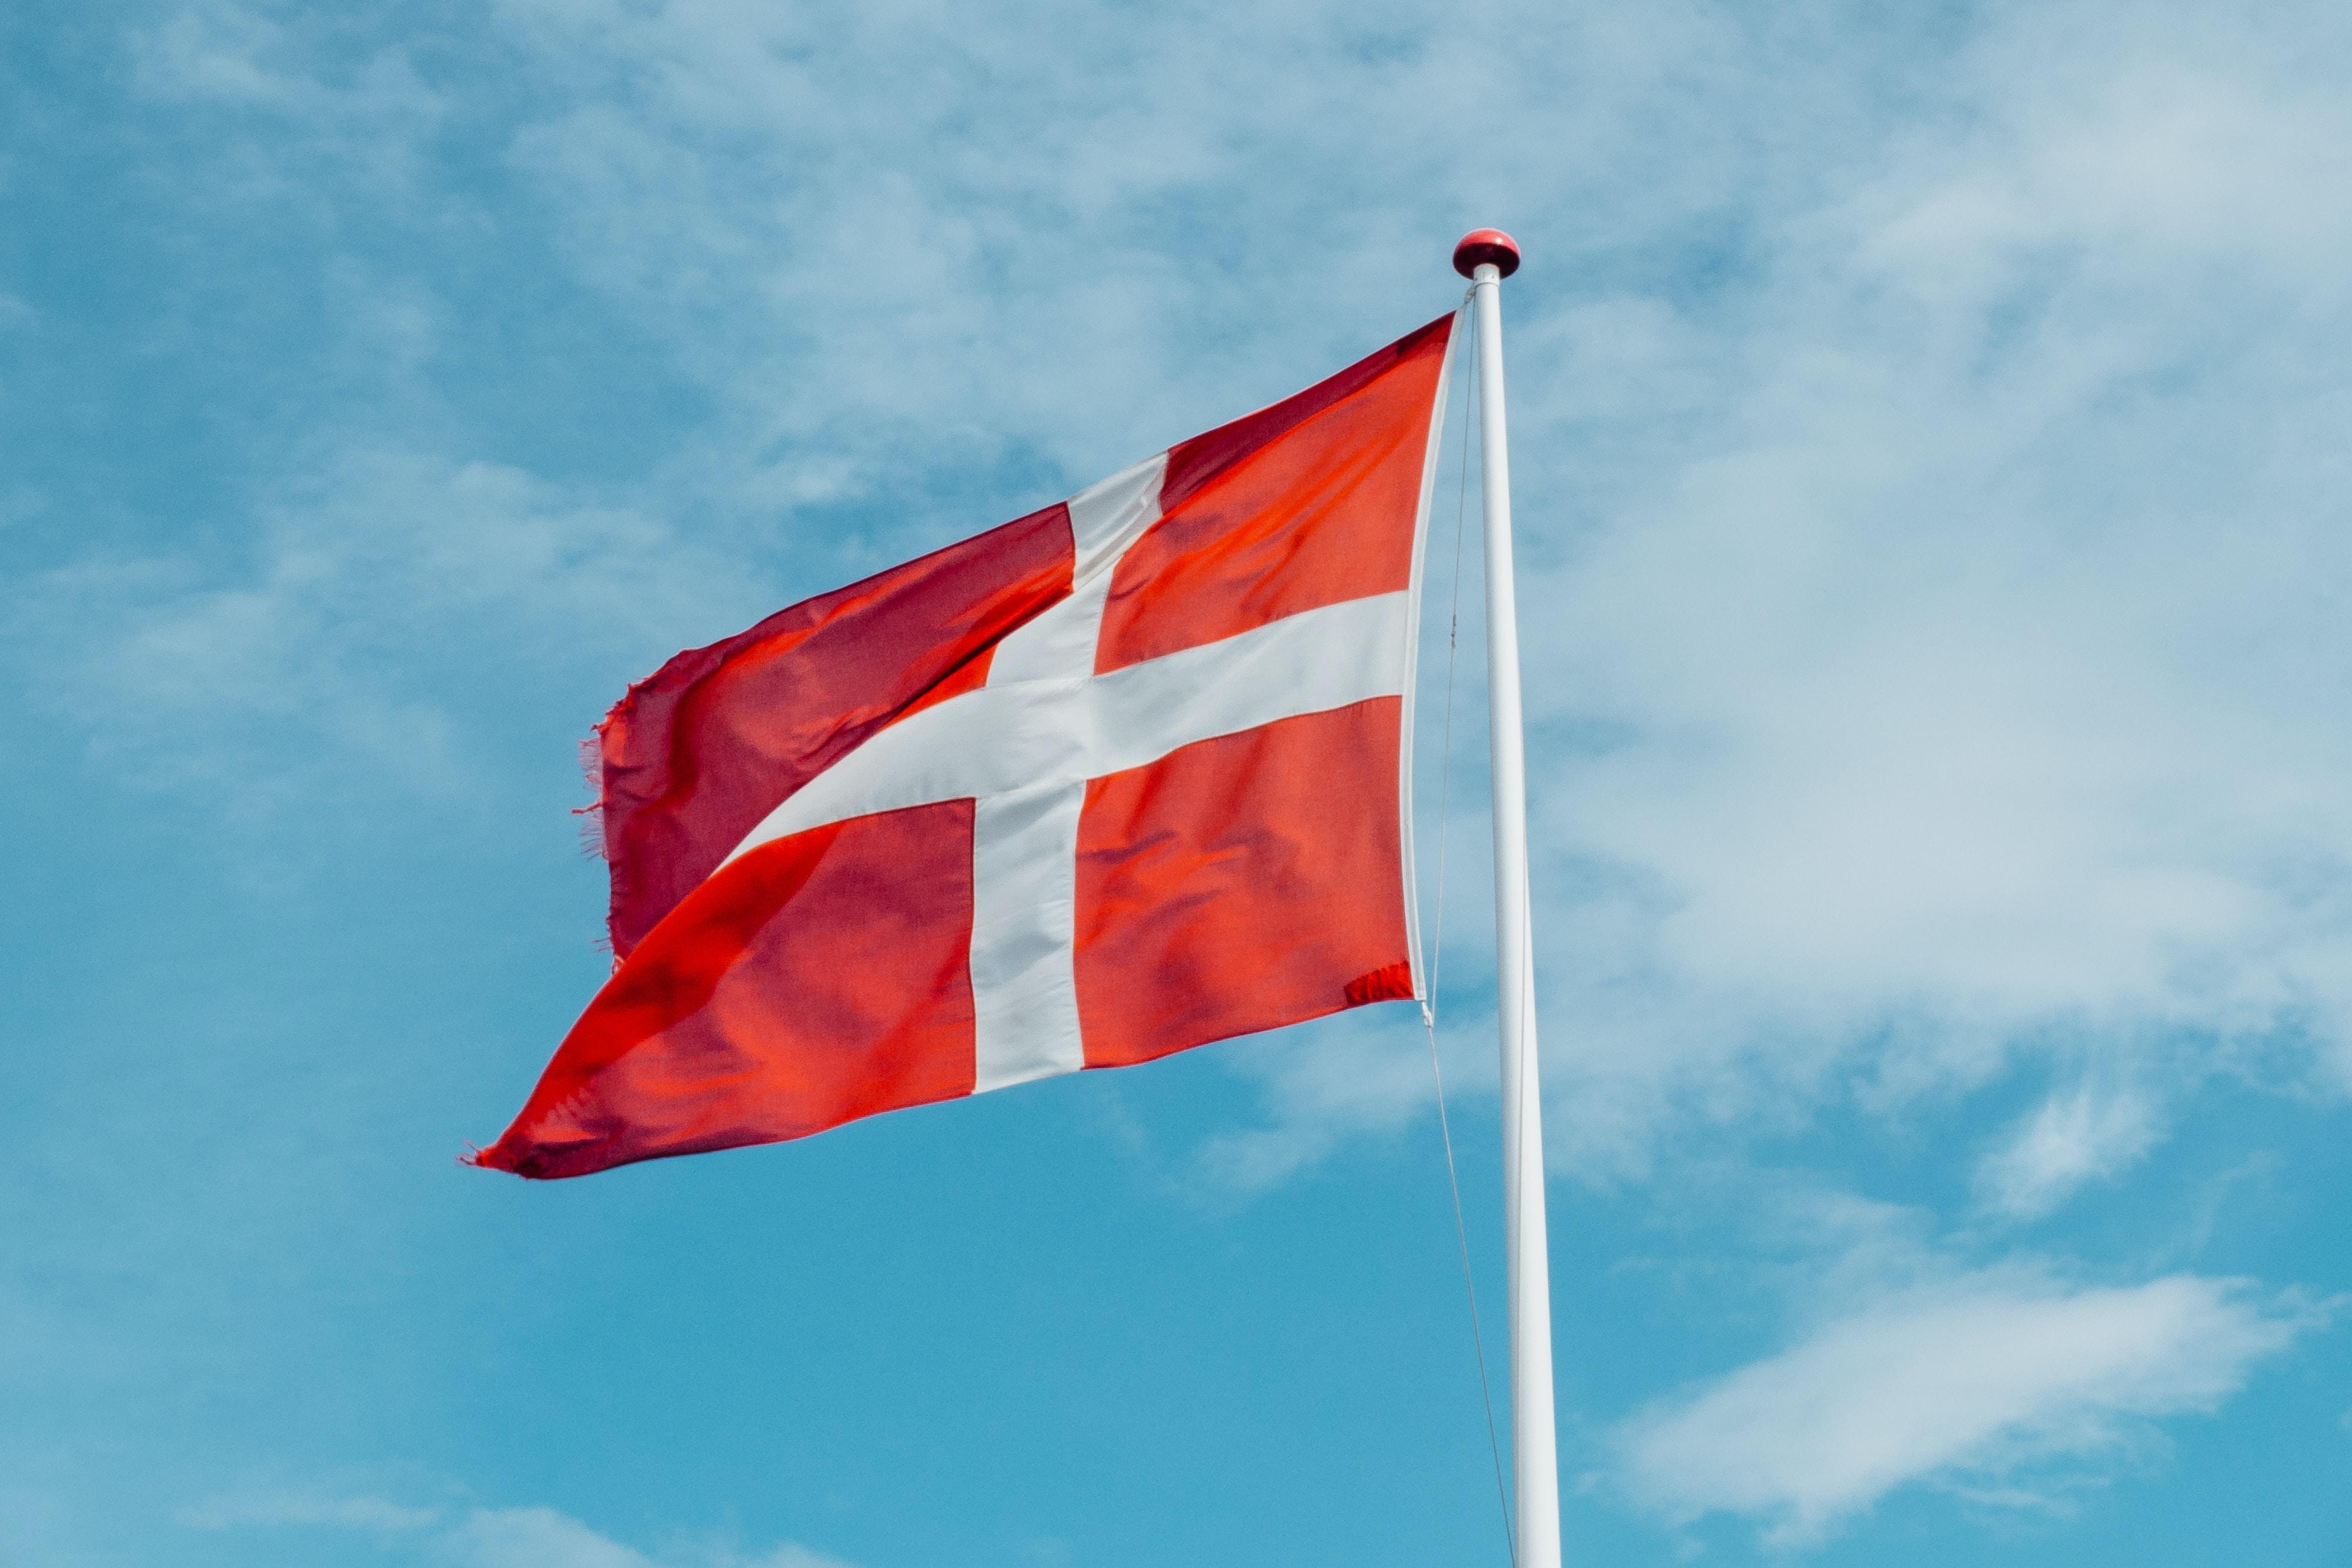 Eurovision Song Contest Dänemark 2021